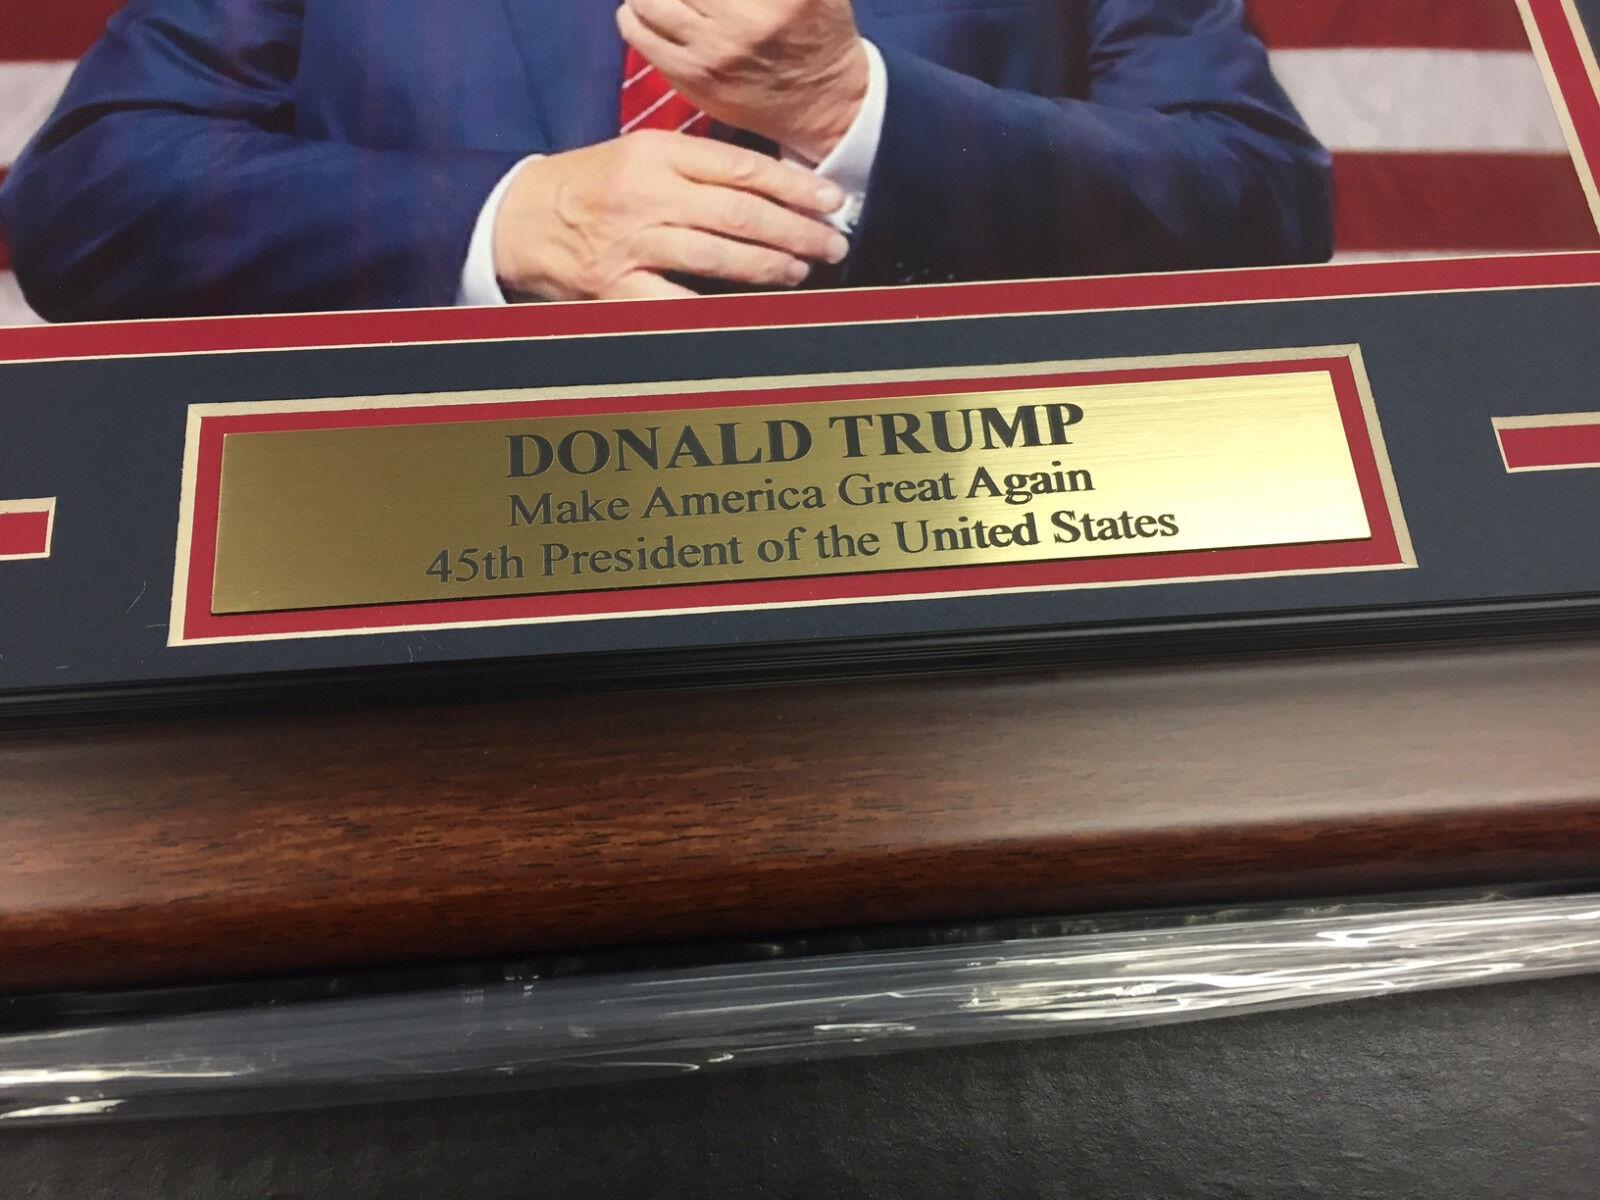 DONALD TRUMP 45TH US PRESIDENT MAKE AMERICA GREAT AGAIN FRAMED 8x10 PHOTO